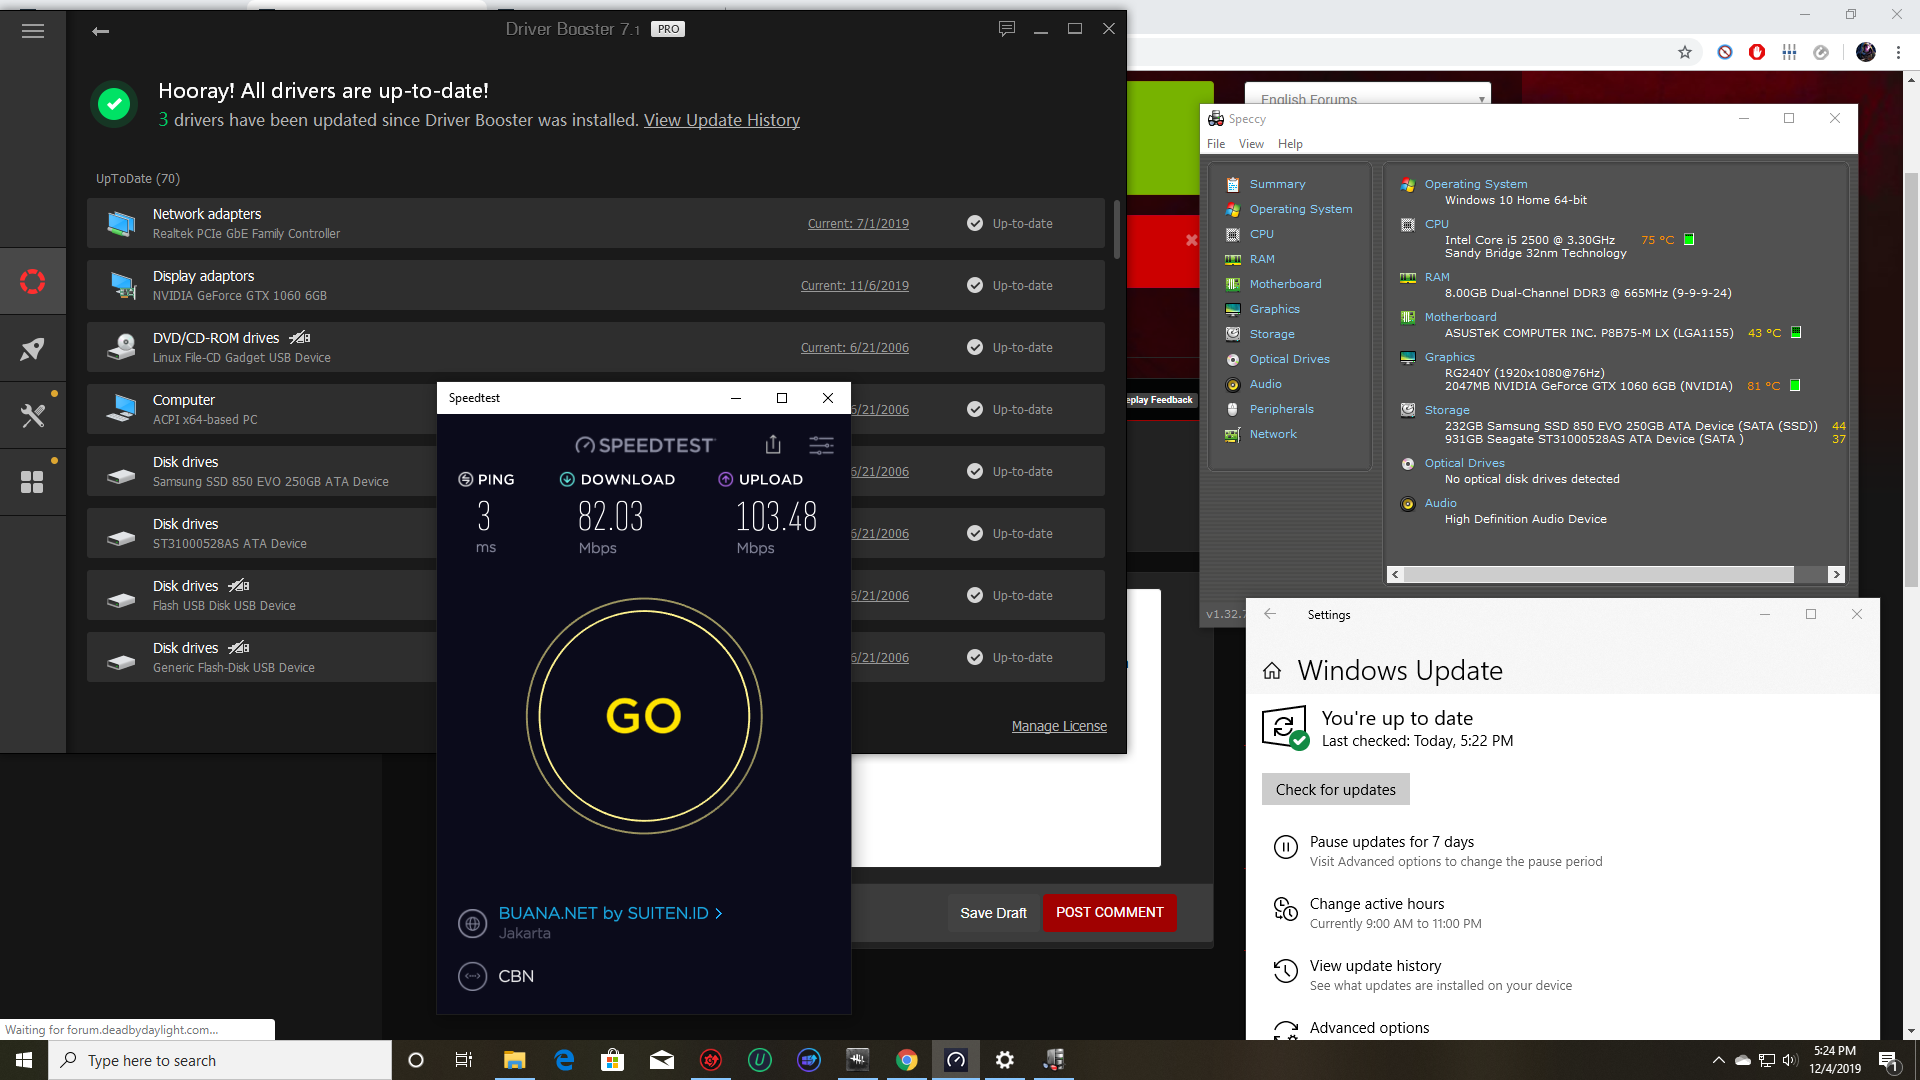 Desktop Screenshot 2019.12.04 - 17.24.39.48.png